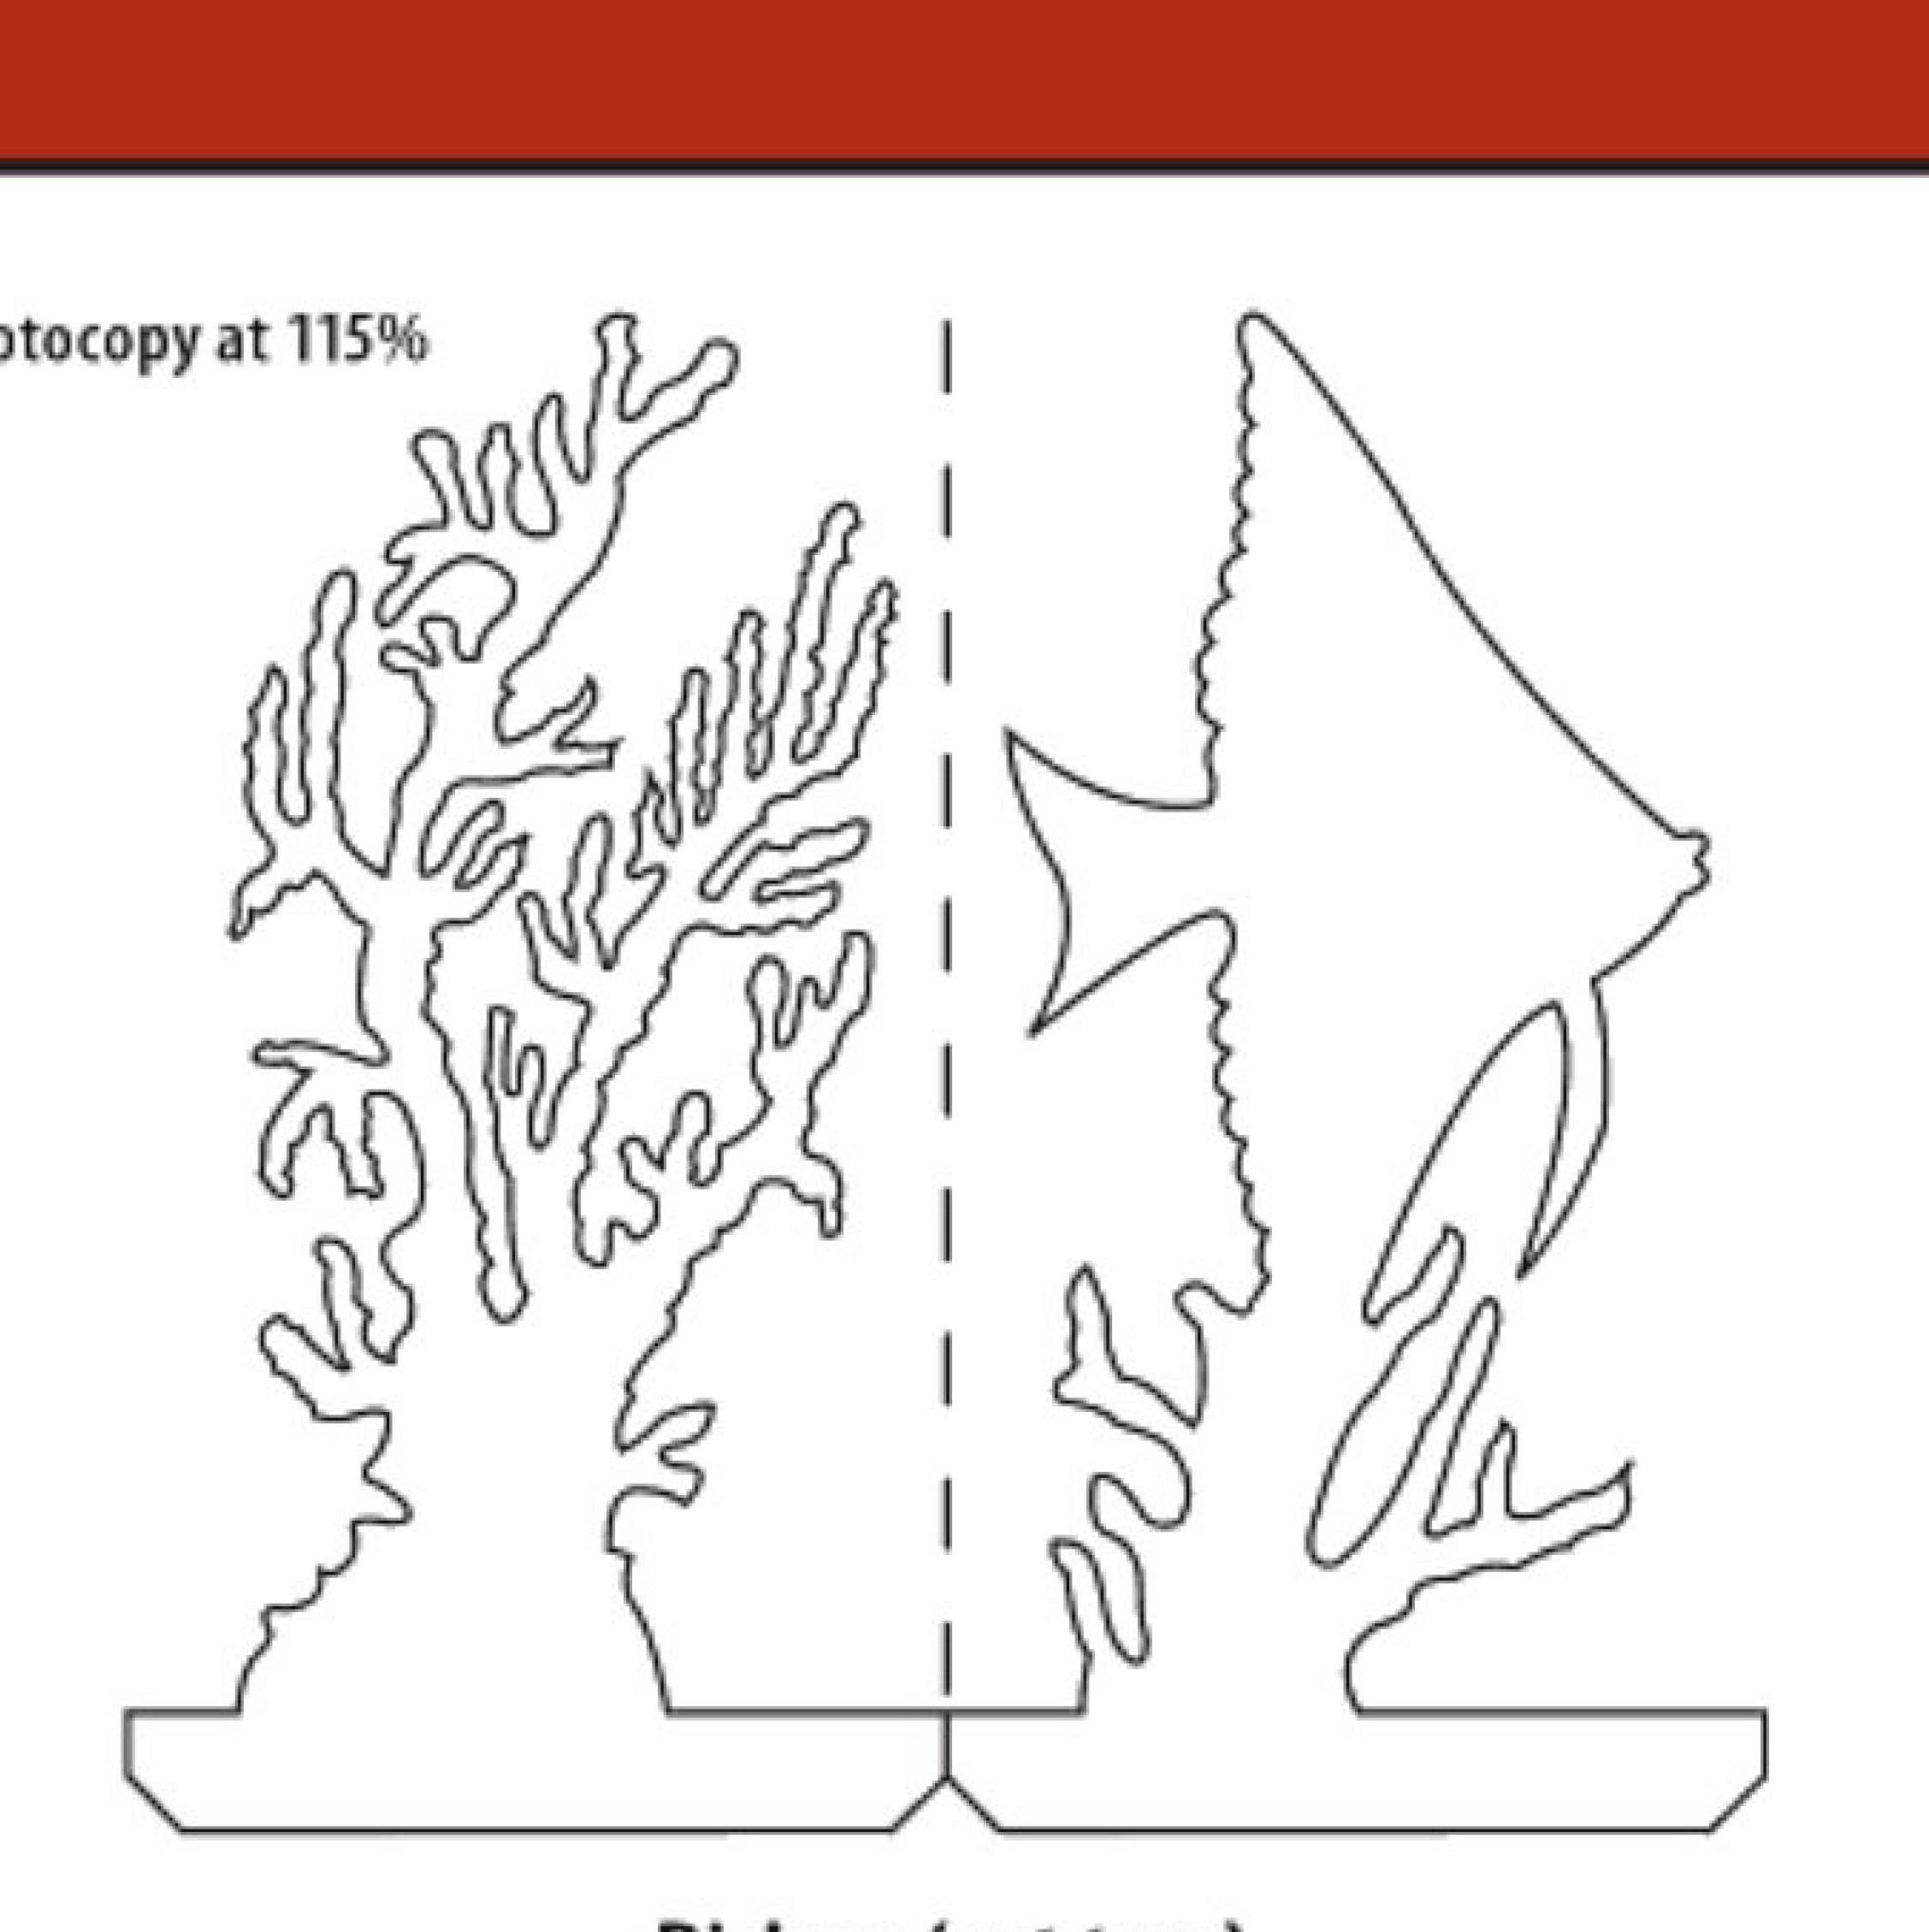 Pin de carlosll en Plantilla | Pinterest | Talla de madera, Madera y 3d